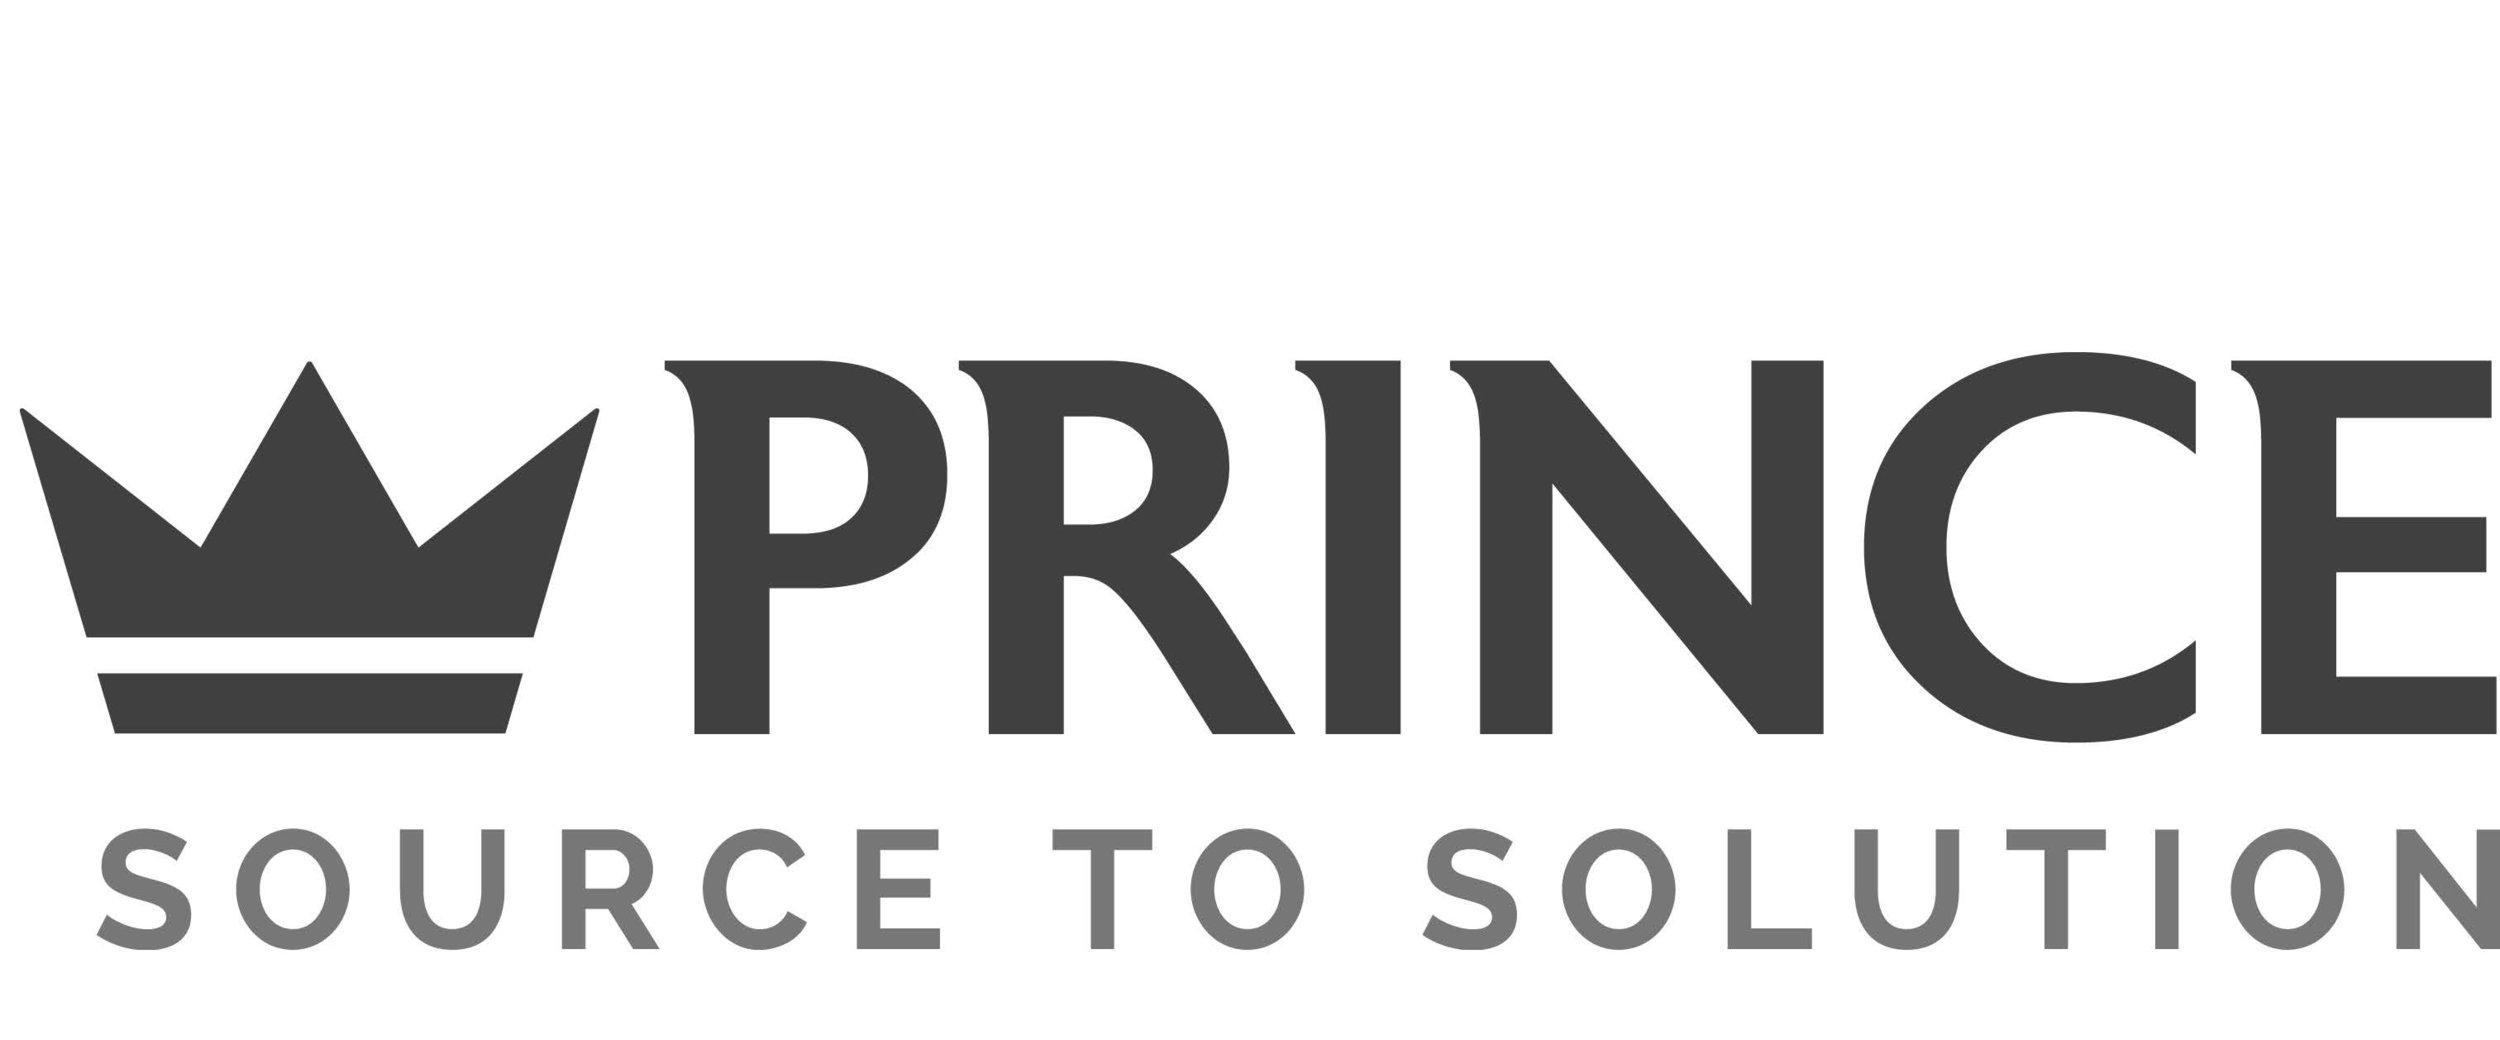 Prince Logo B&W v1.jpg